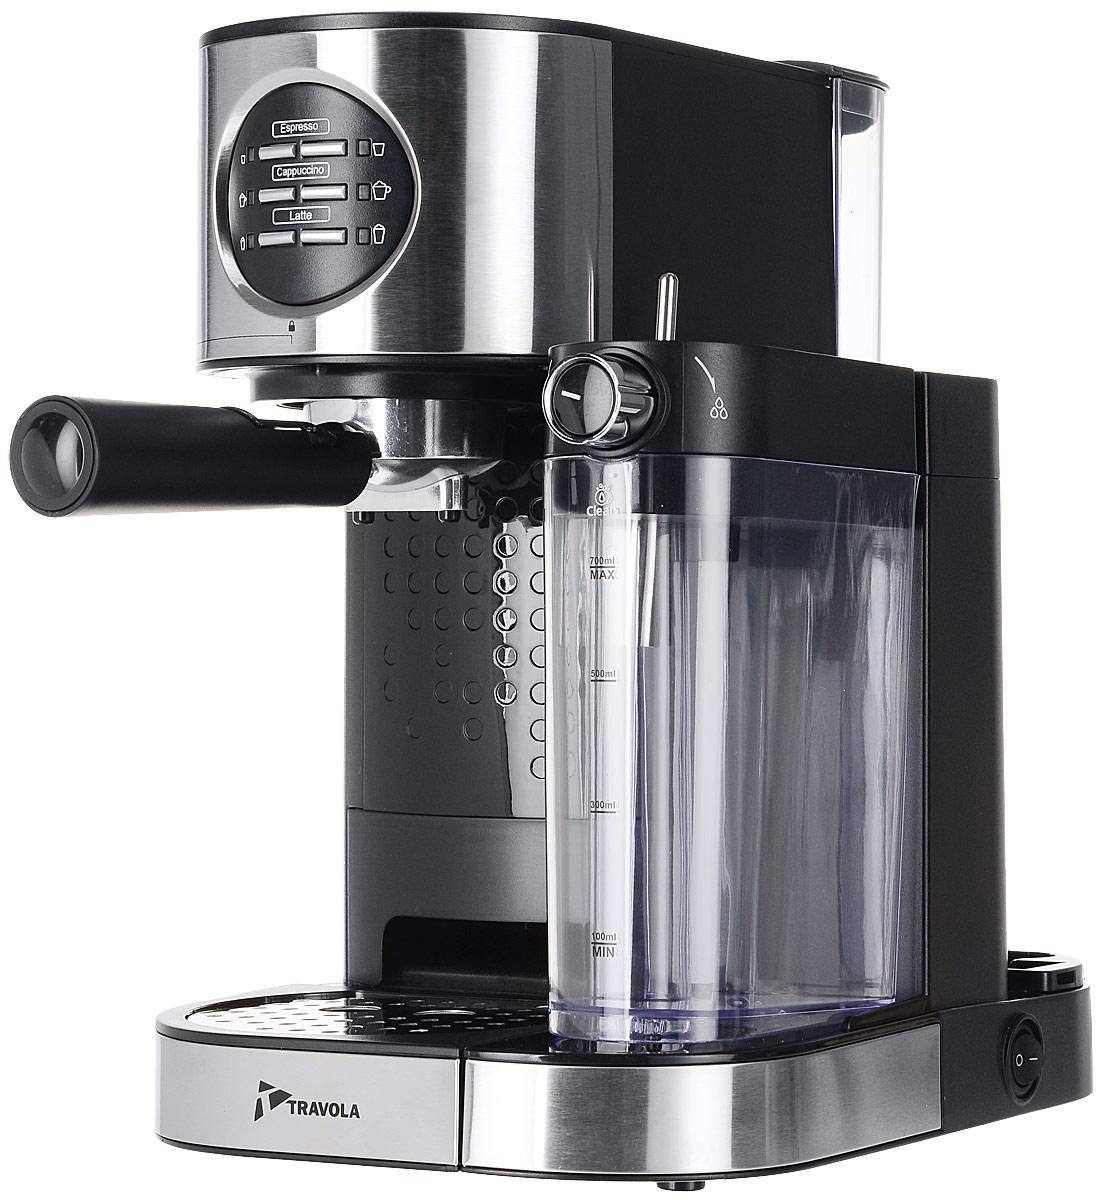 Travola CM5009-GS кофеварка - Кофеварки и кофемашины